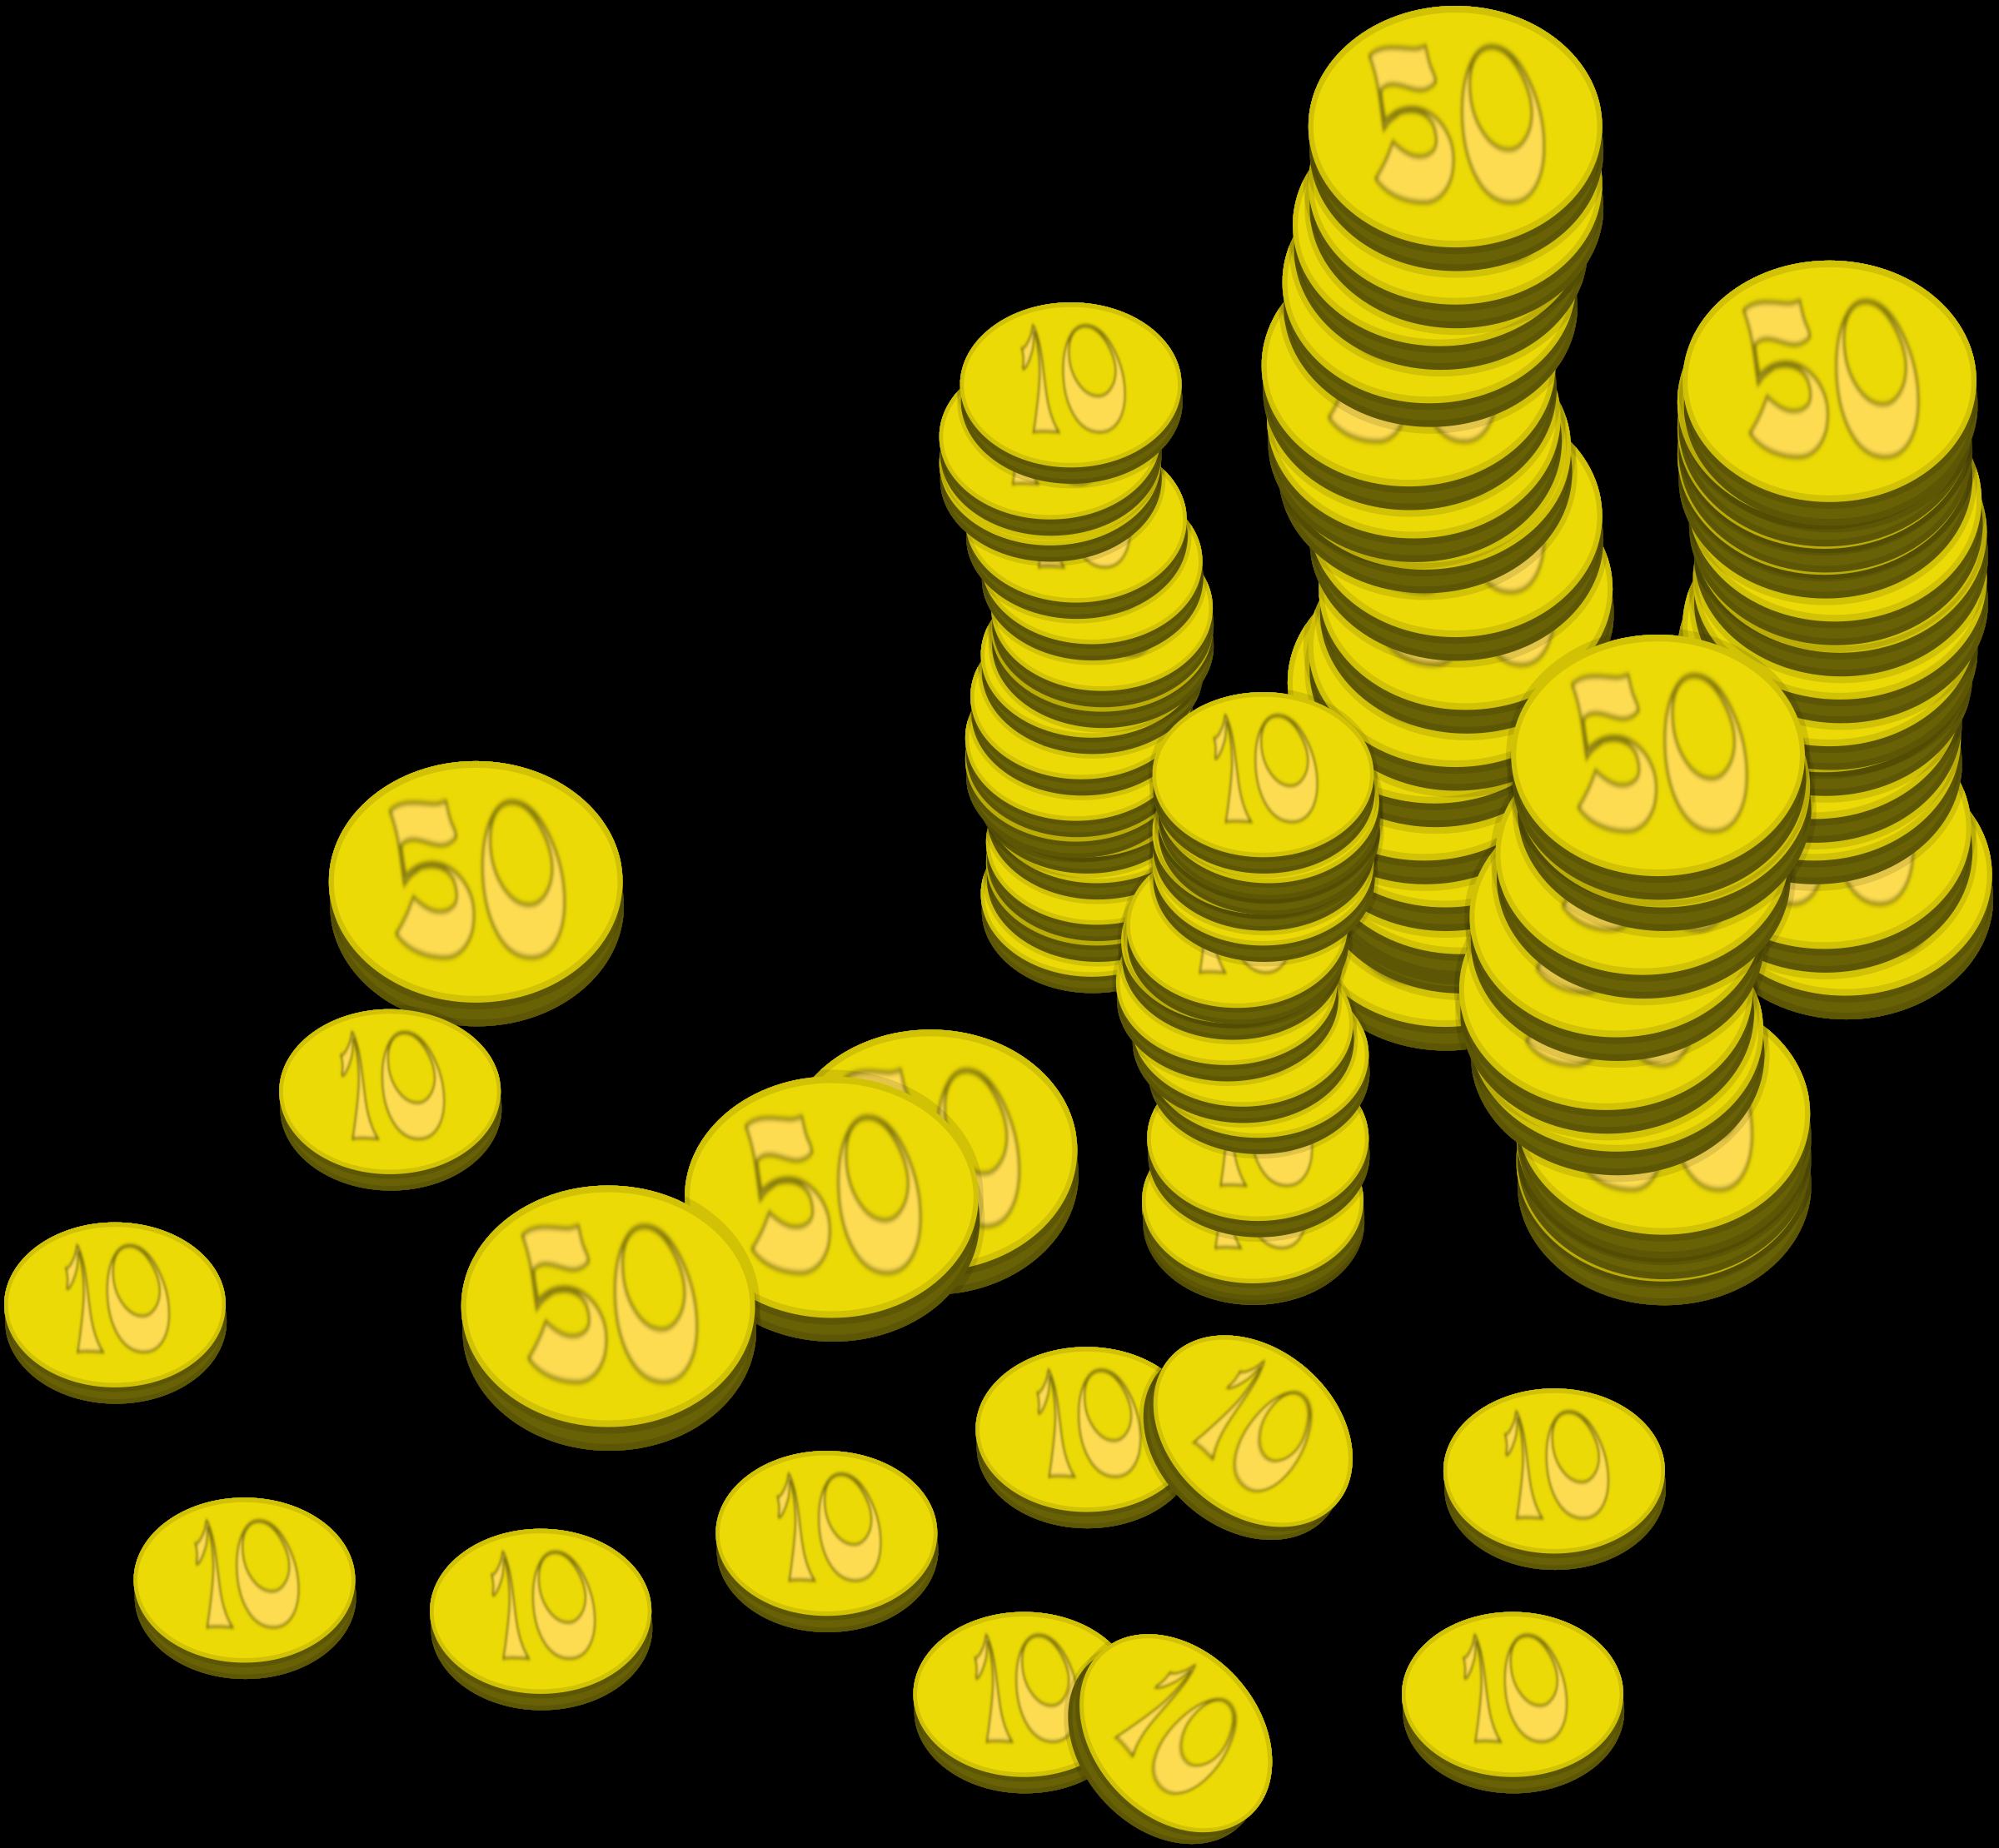 Coins money big image. Treasure clipart word